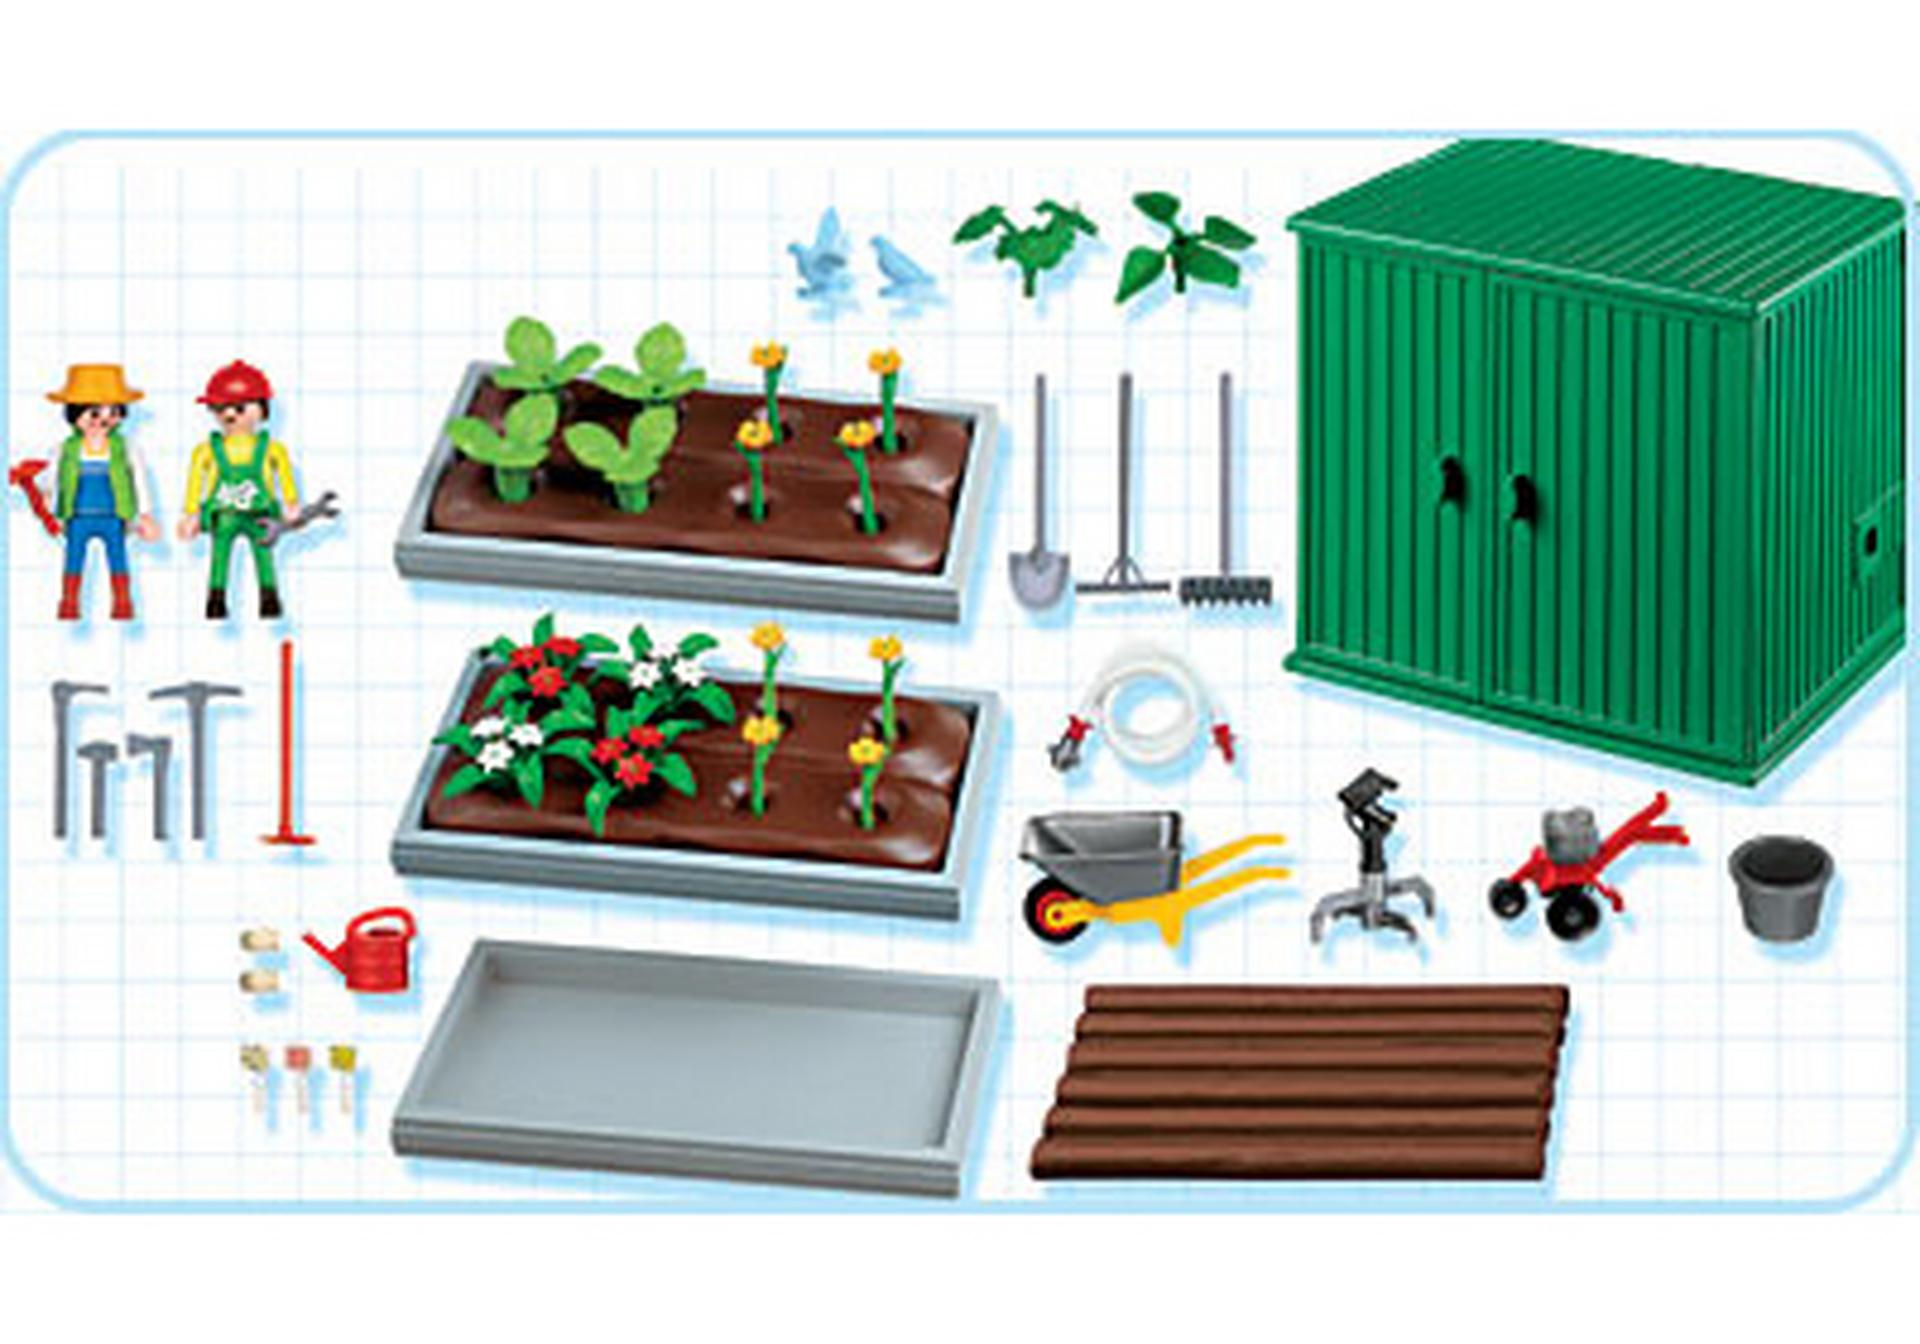 Horticulteurs / plantations / abri de jardin - 4482-A - PLAYMOBIL ...